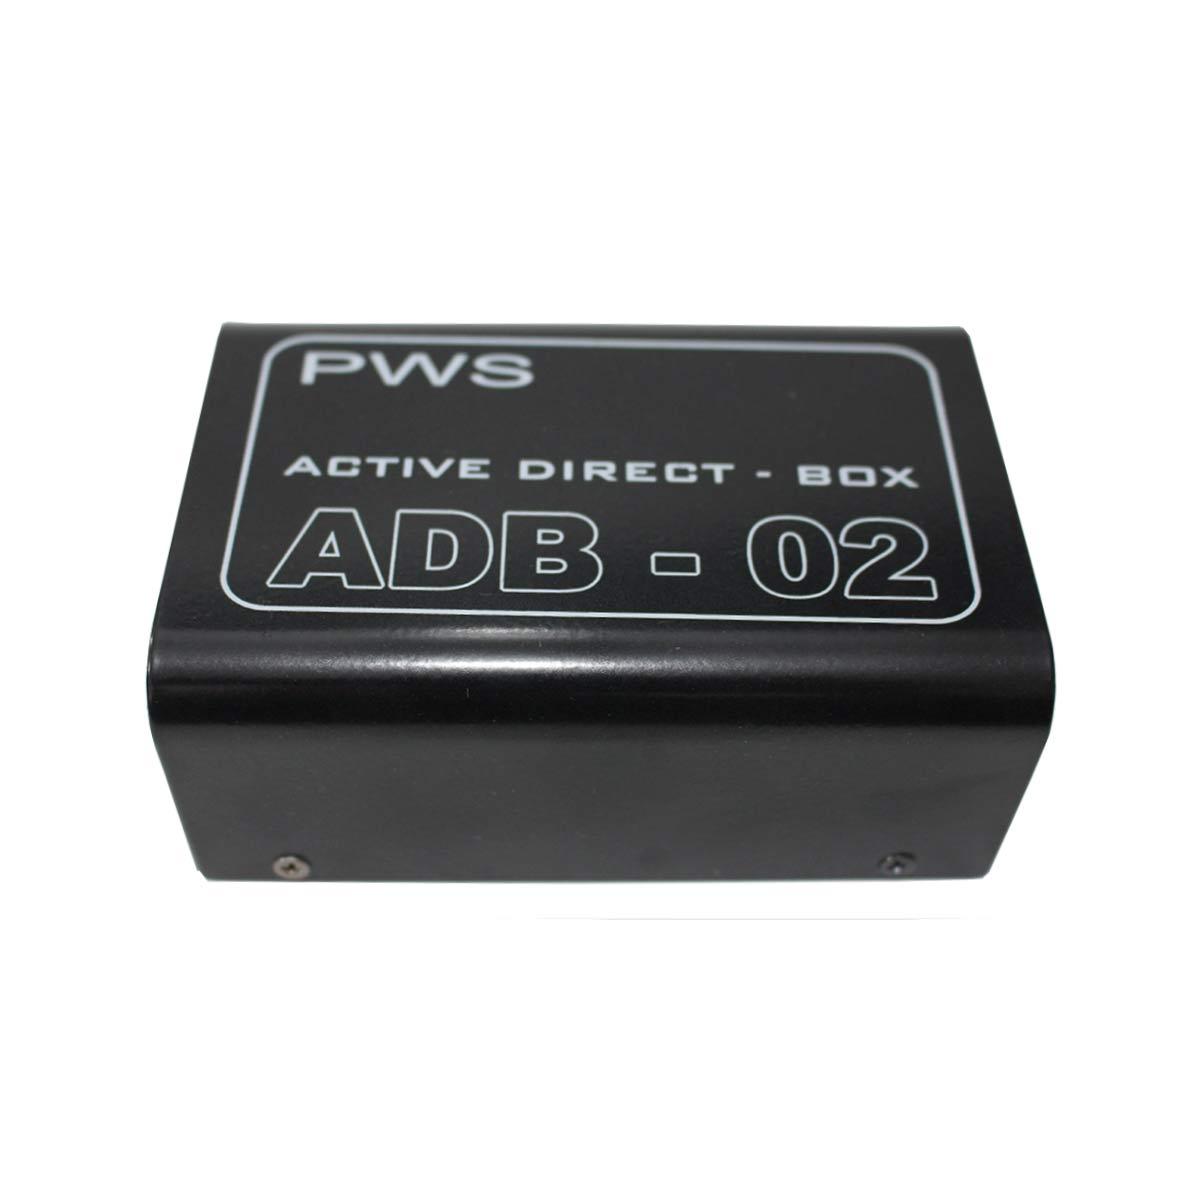 ADB02 - Direct Box Ativo ADB 02 - PWS